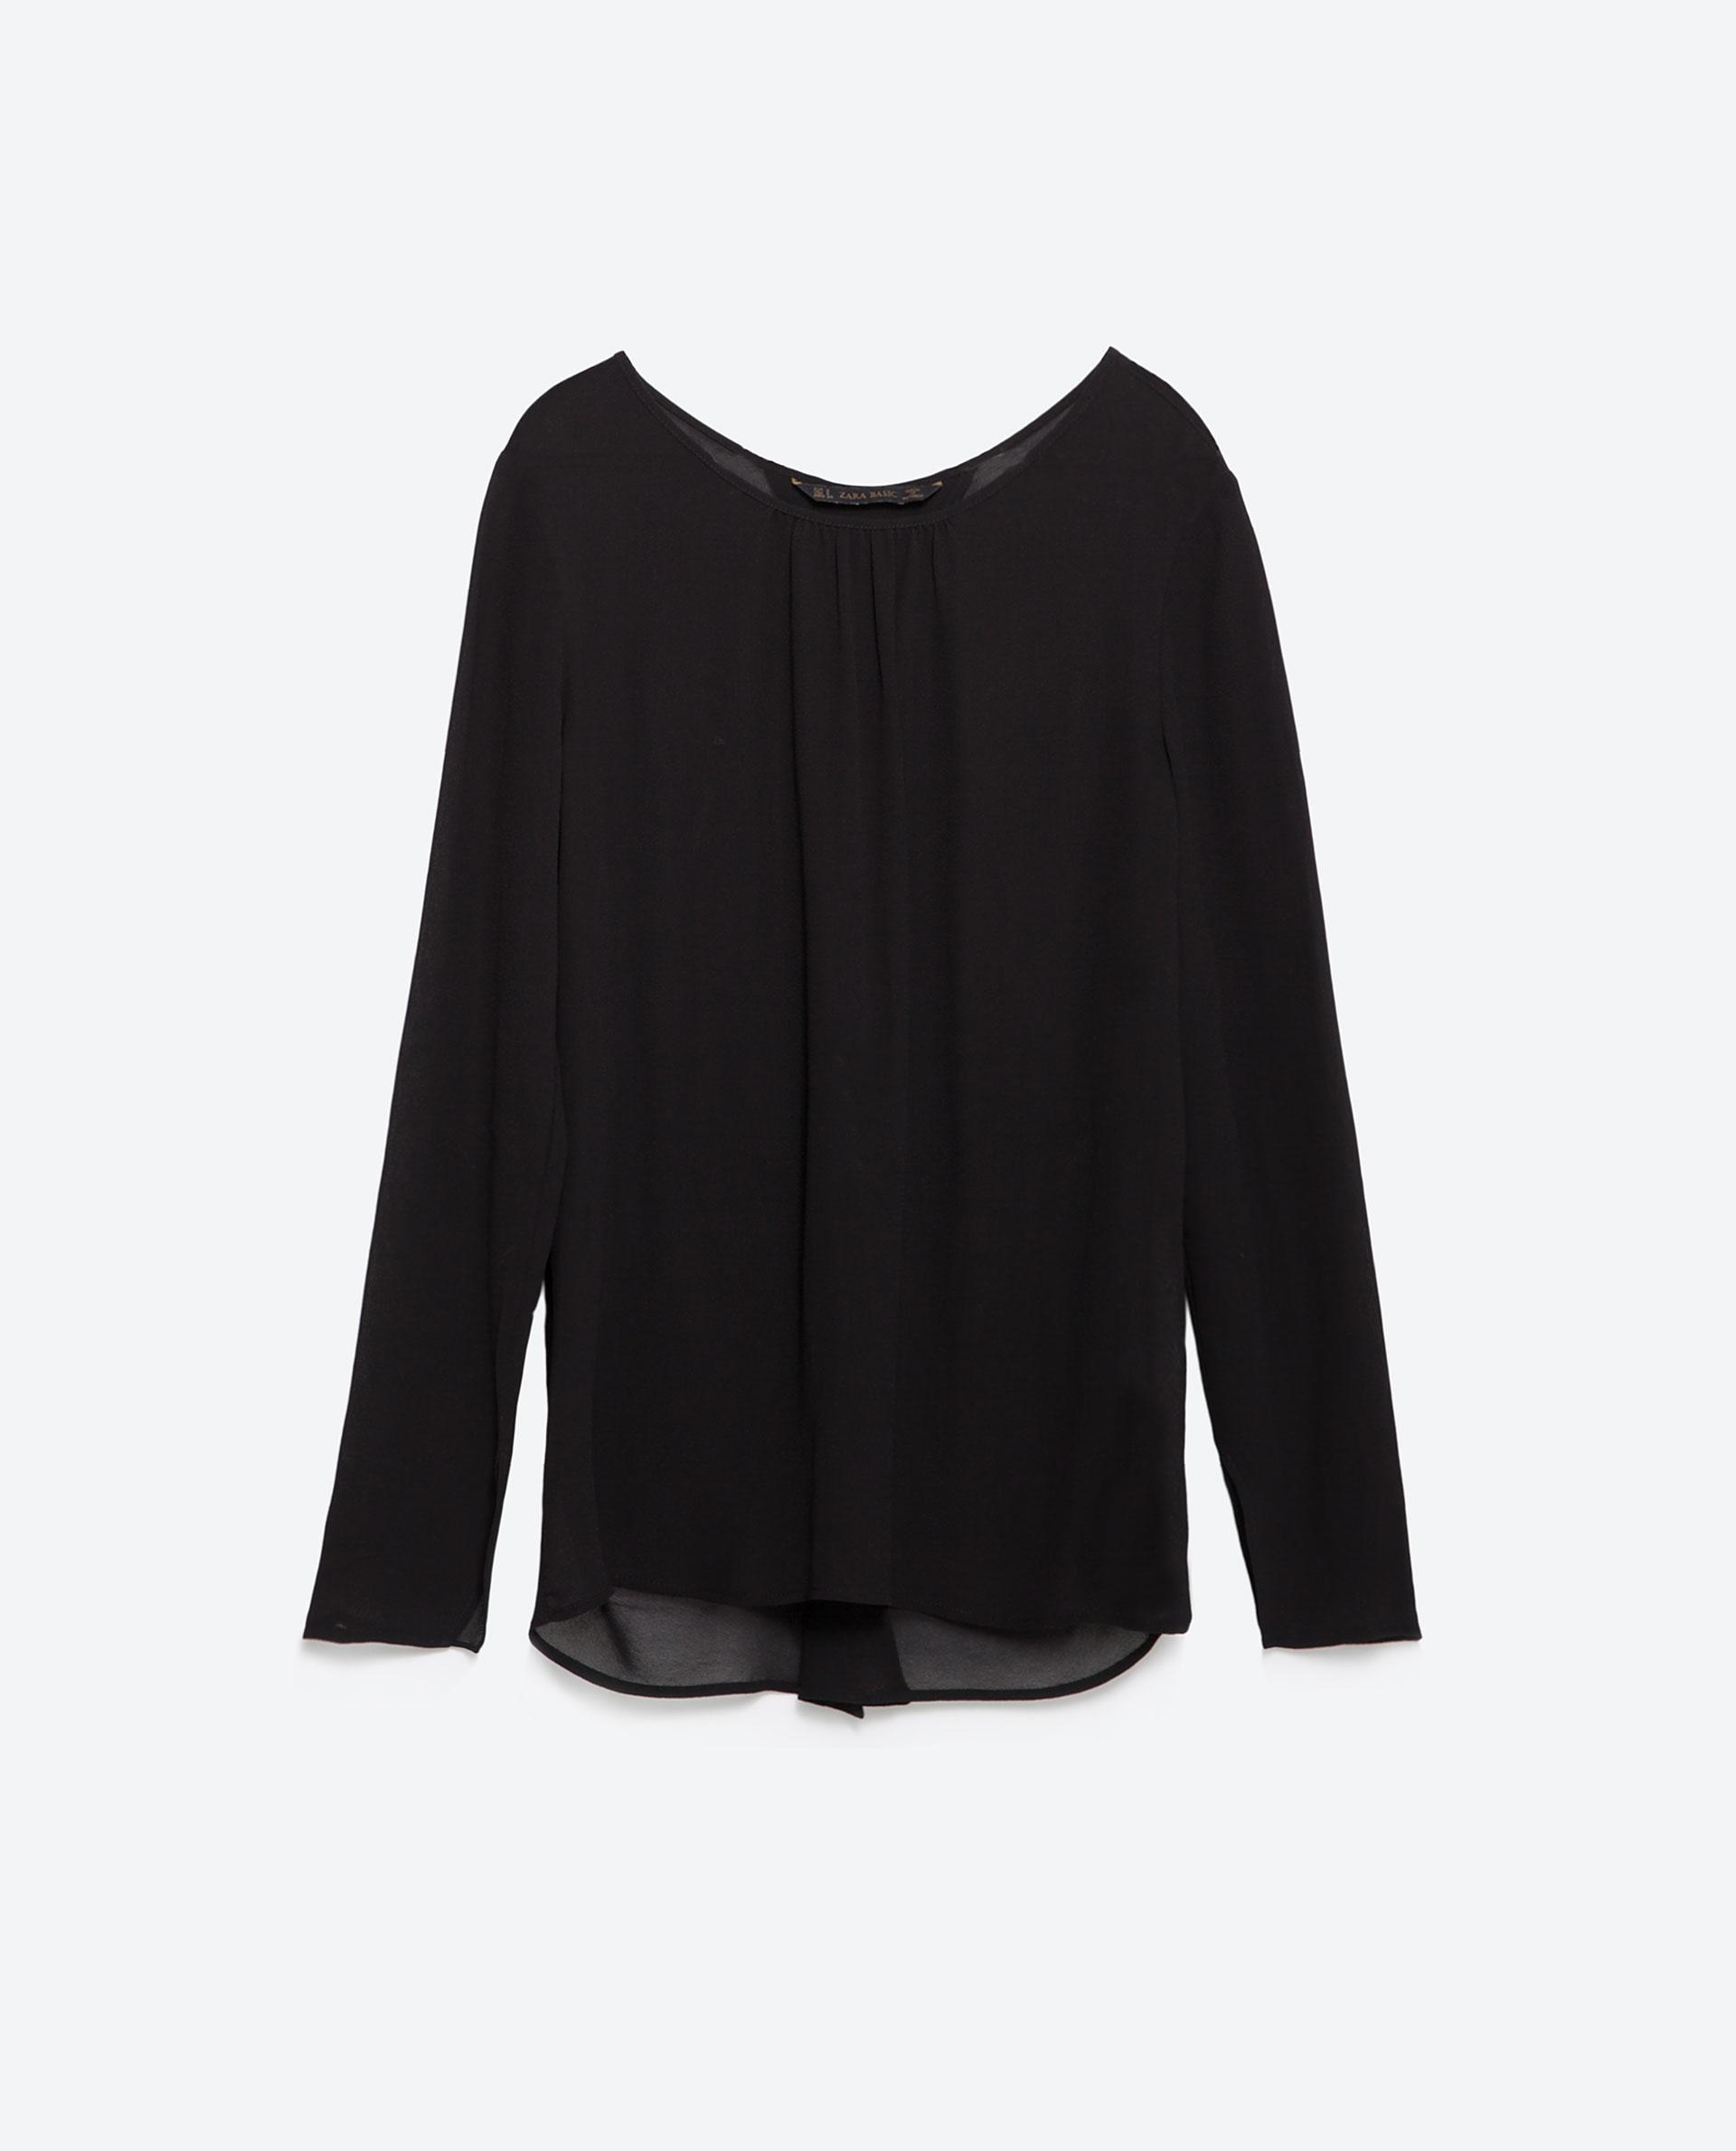 Zara Womens Blouses 92